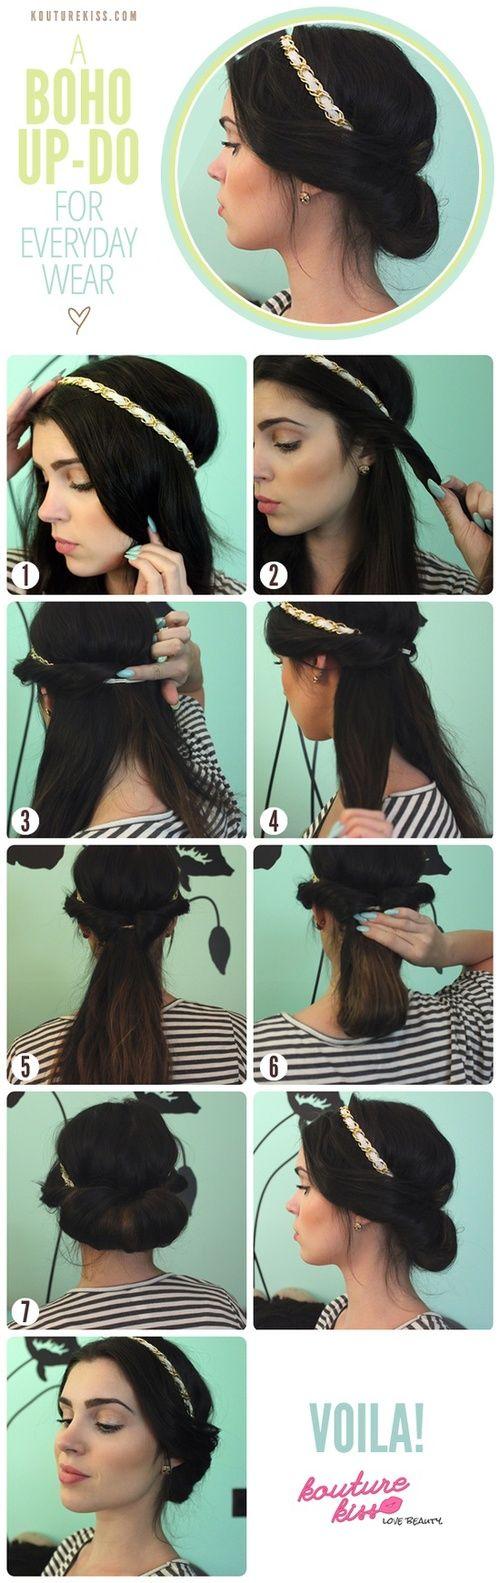 DIY - Boho Updo Tutorial tuto coiffure avec un headband